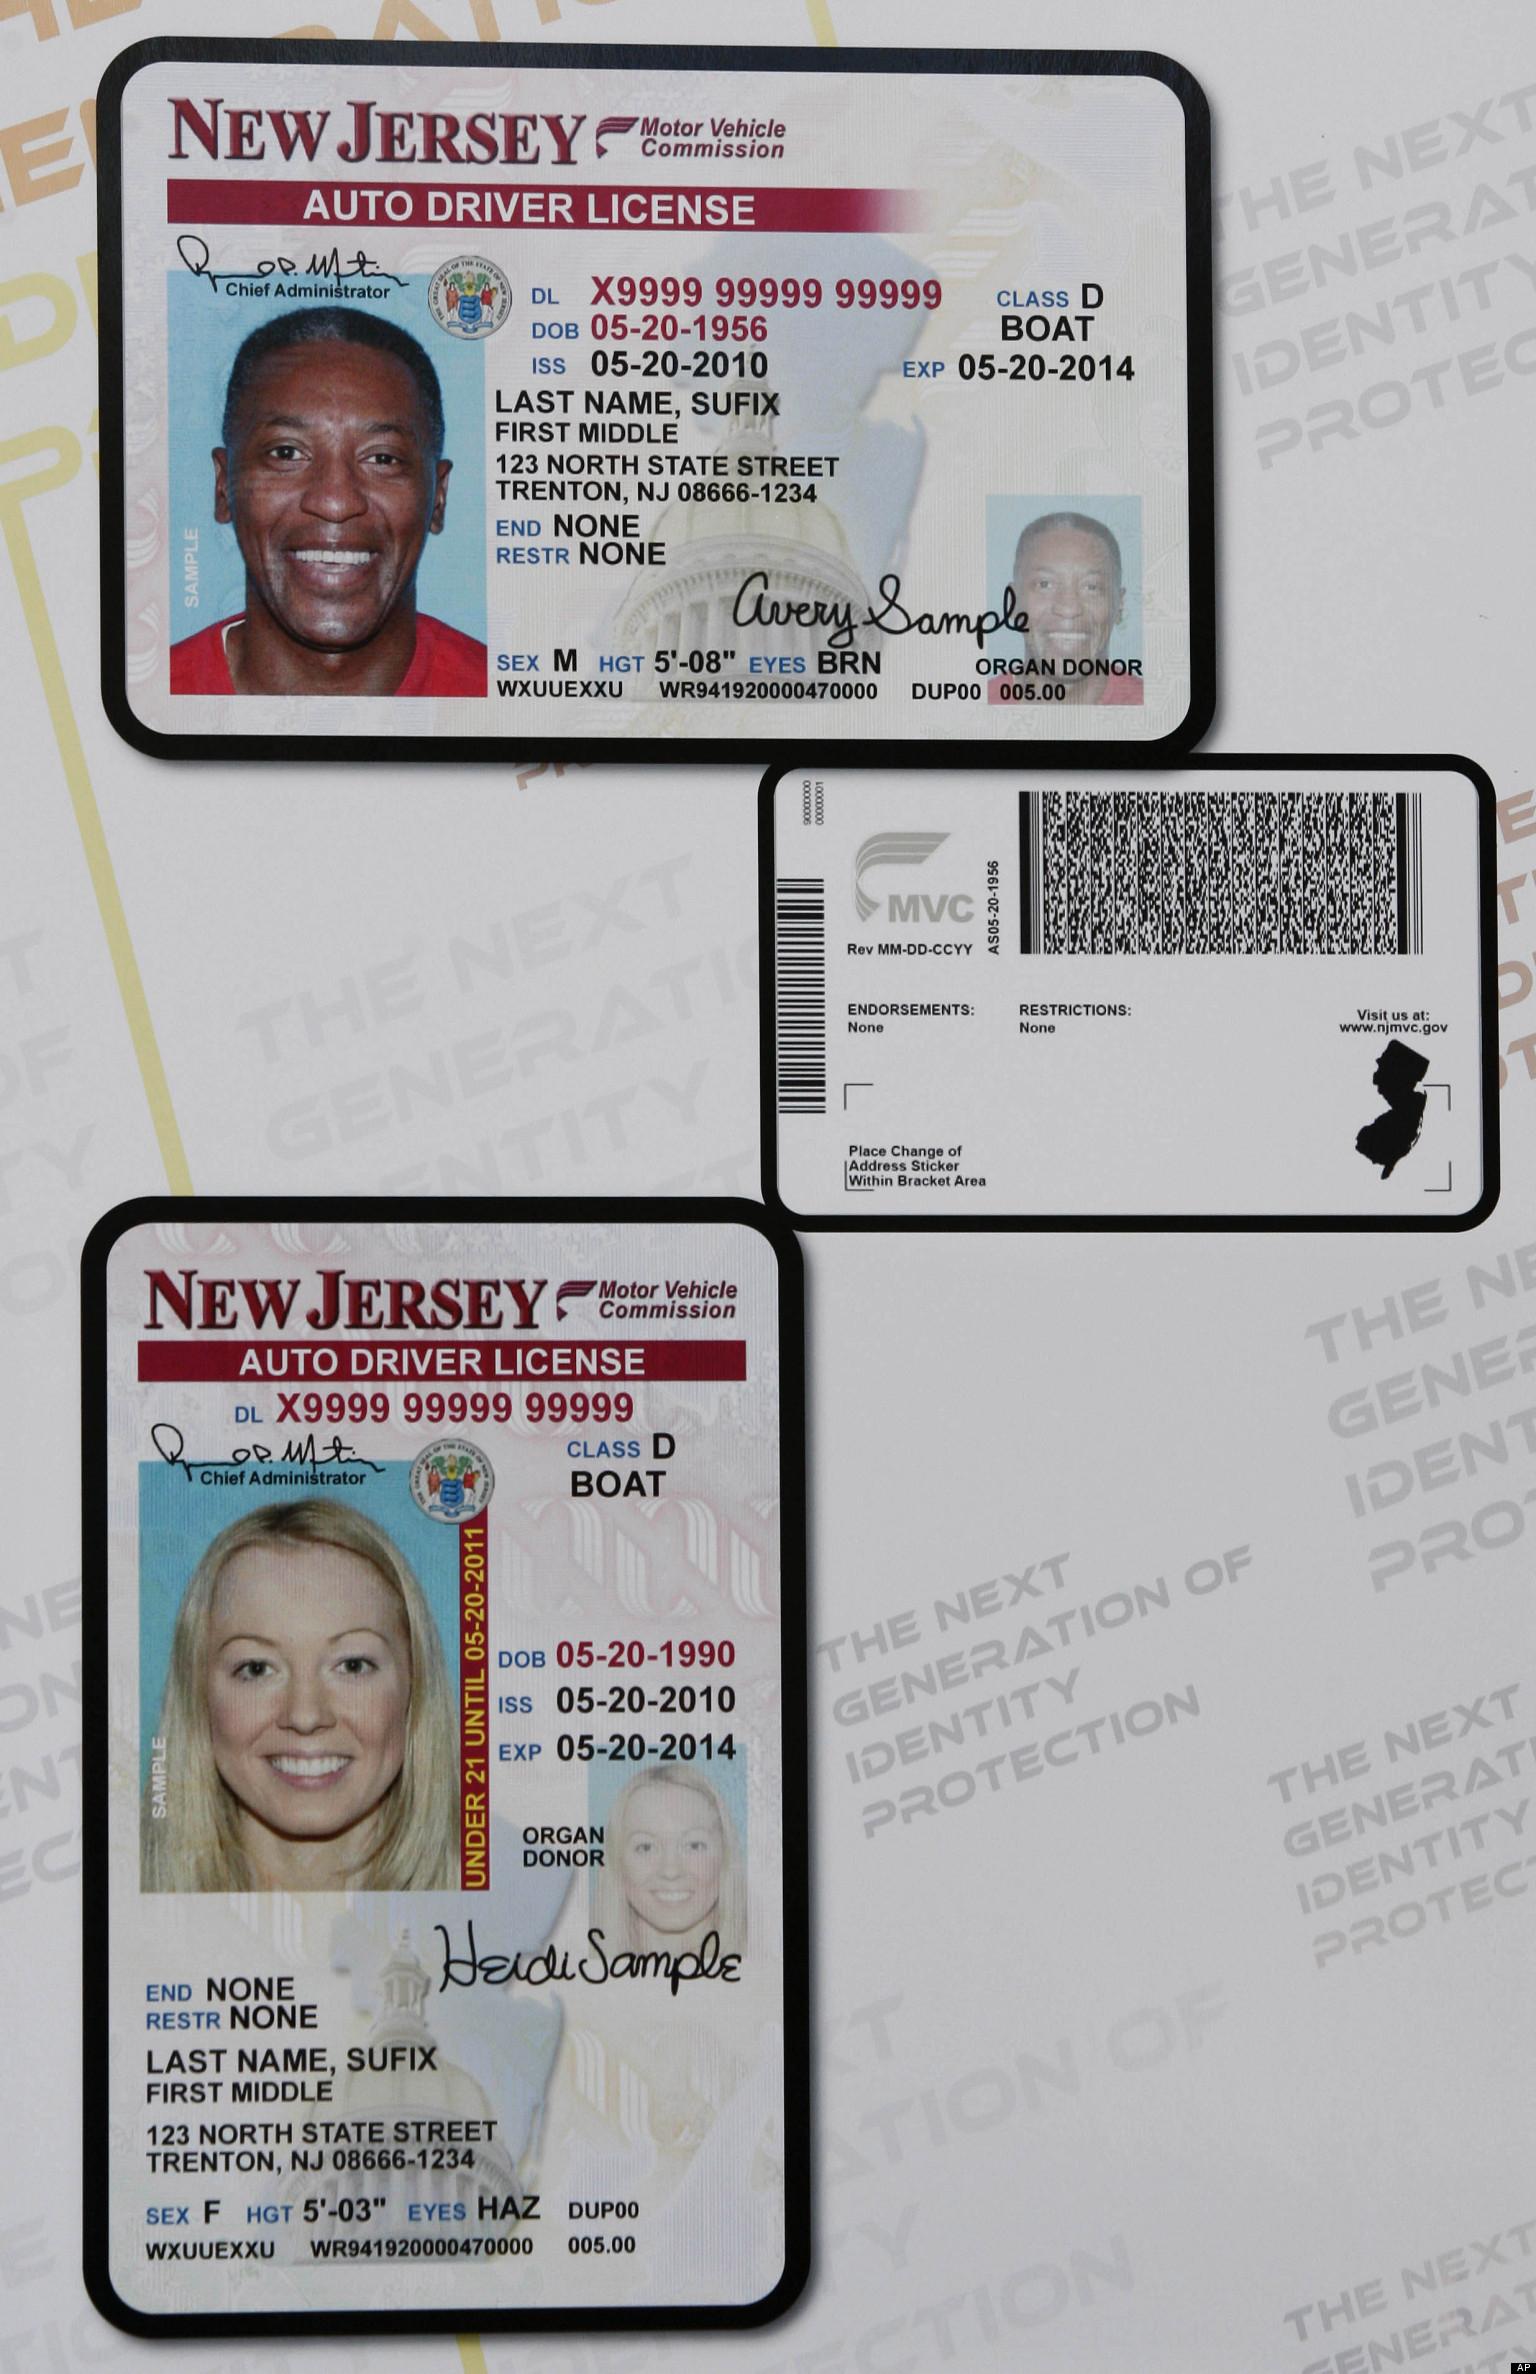 Nj Permit Nj Nj Driver Driver Permit Permit Nj Driver Driver Permit